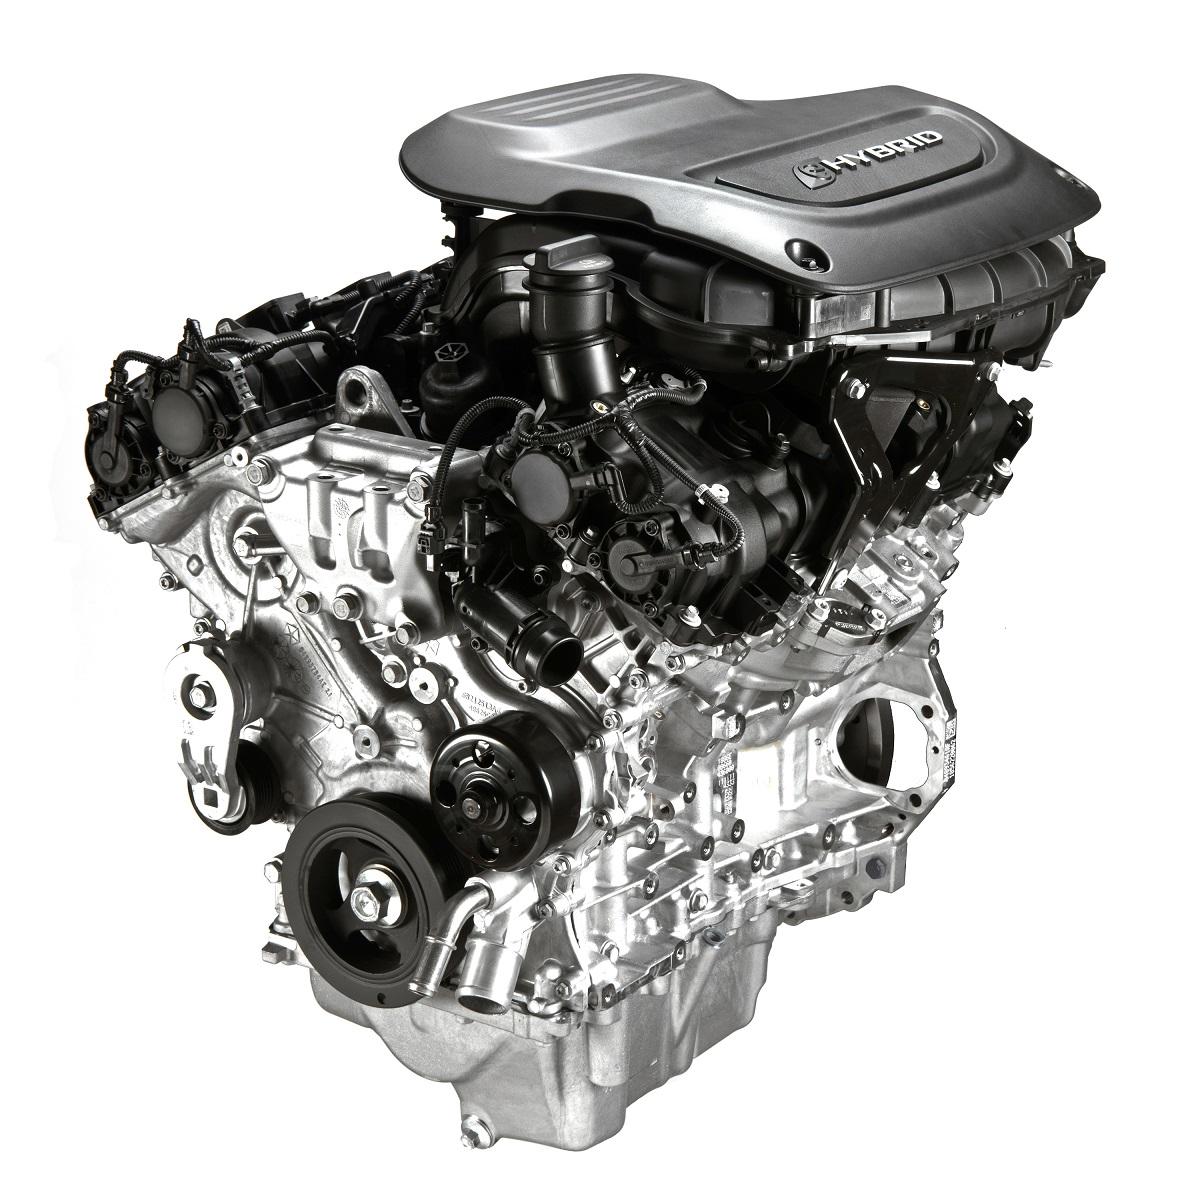 Chrysler Pacifica hybrid Pentastar engine